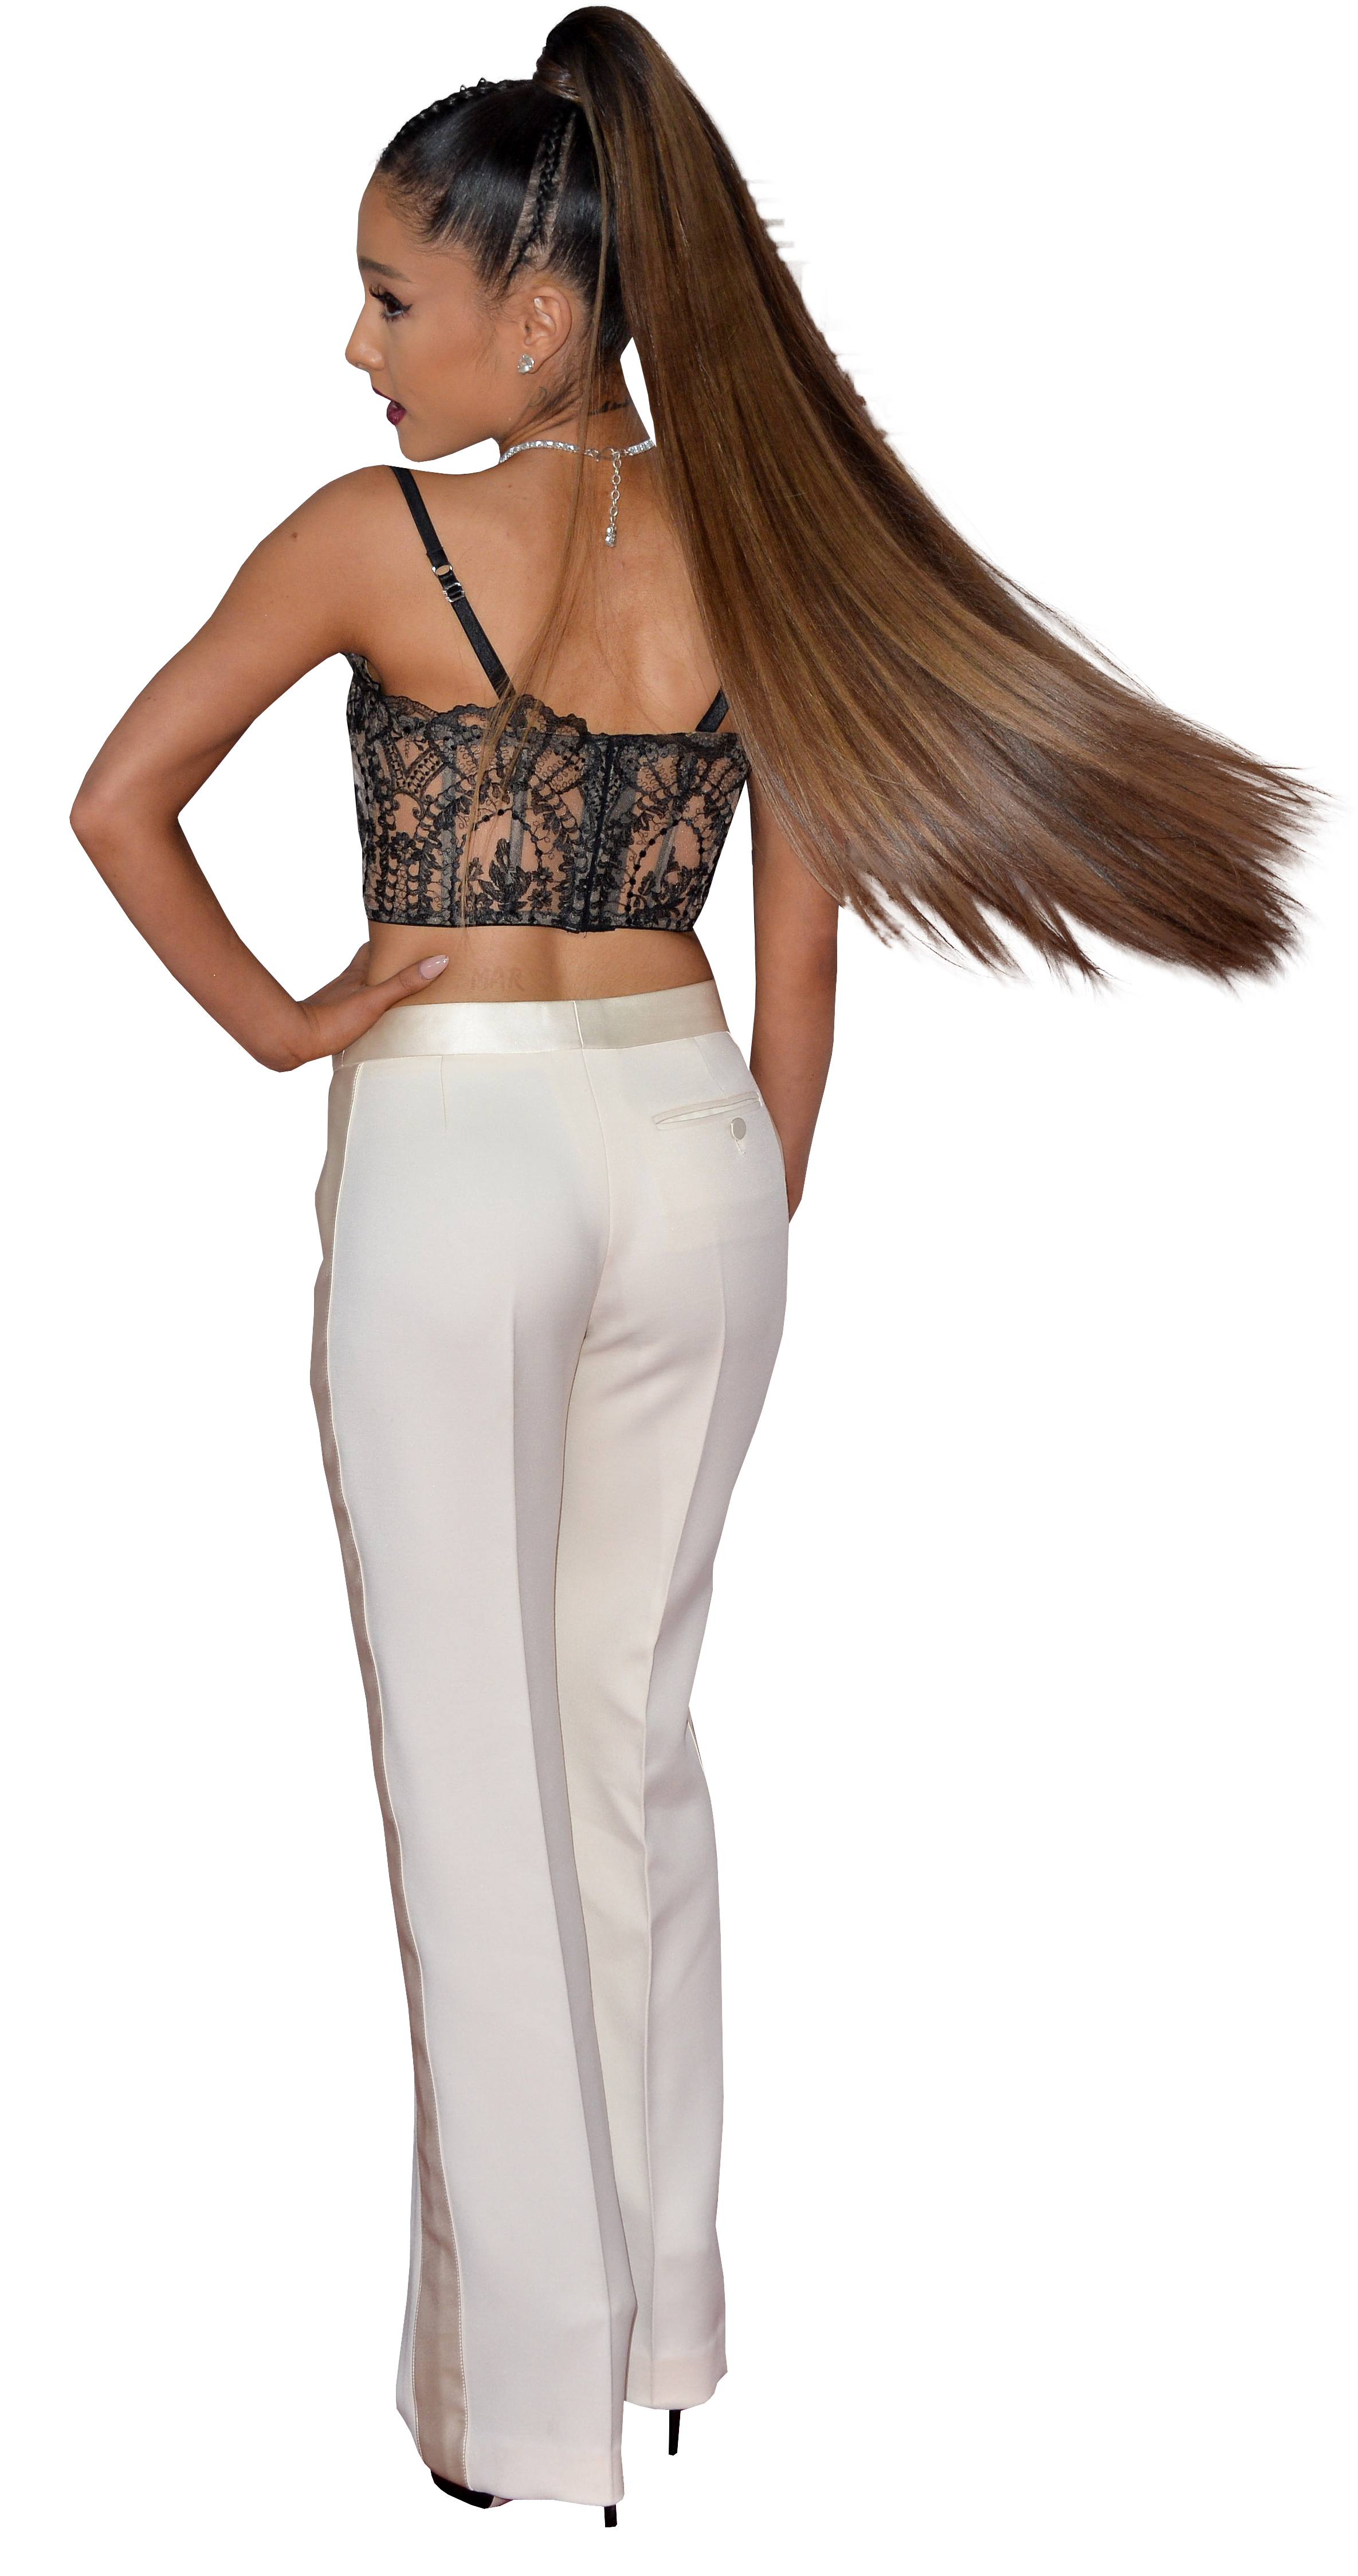 Ariana Grande in white trousers